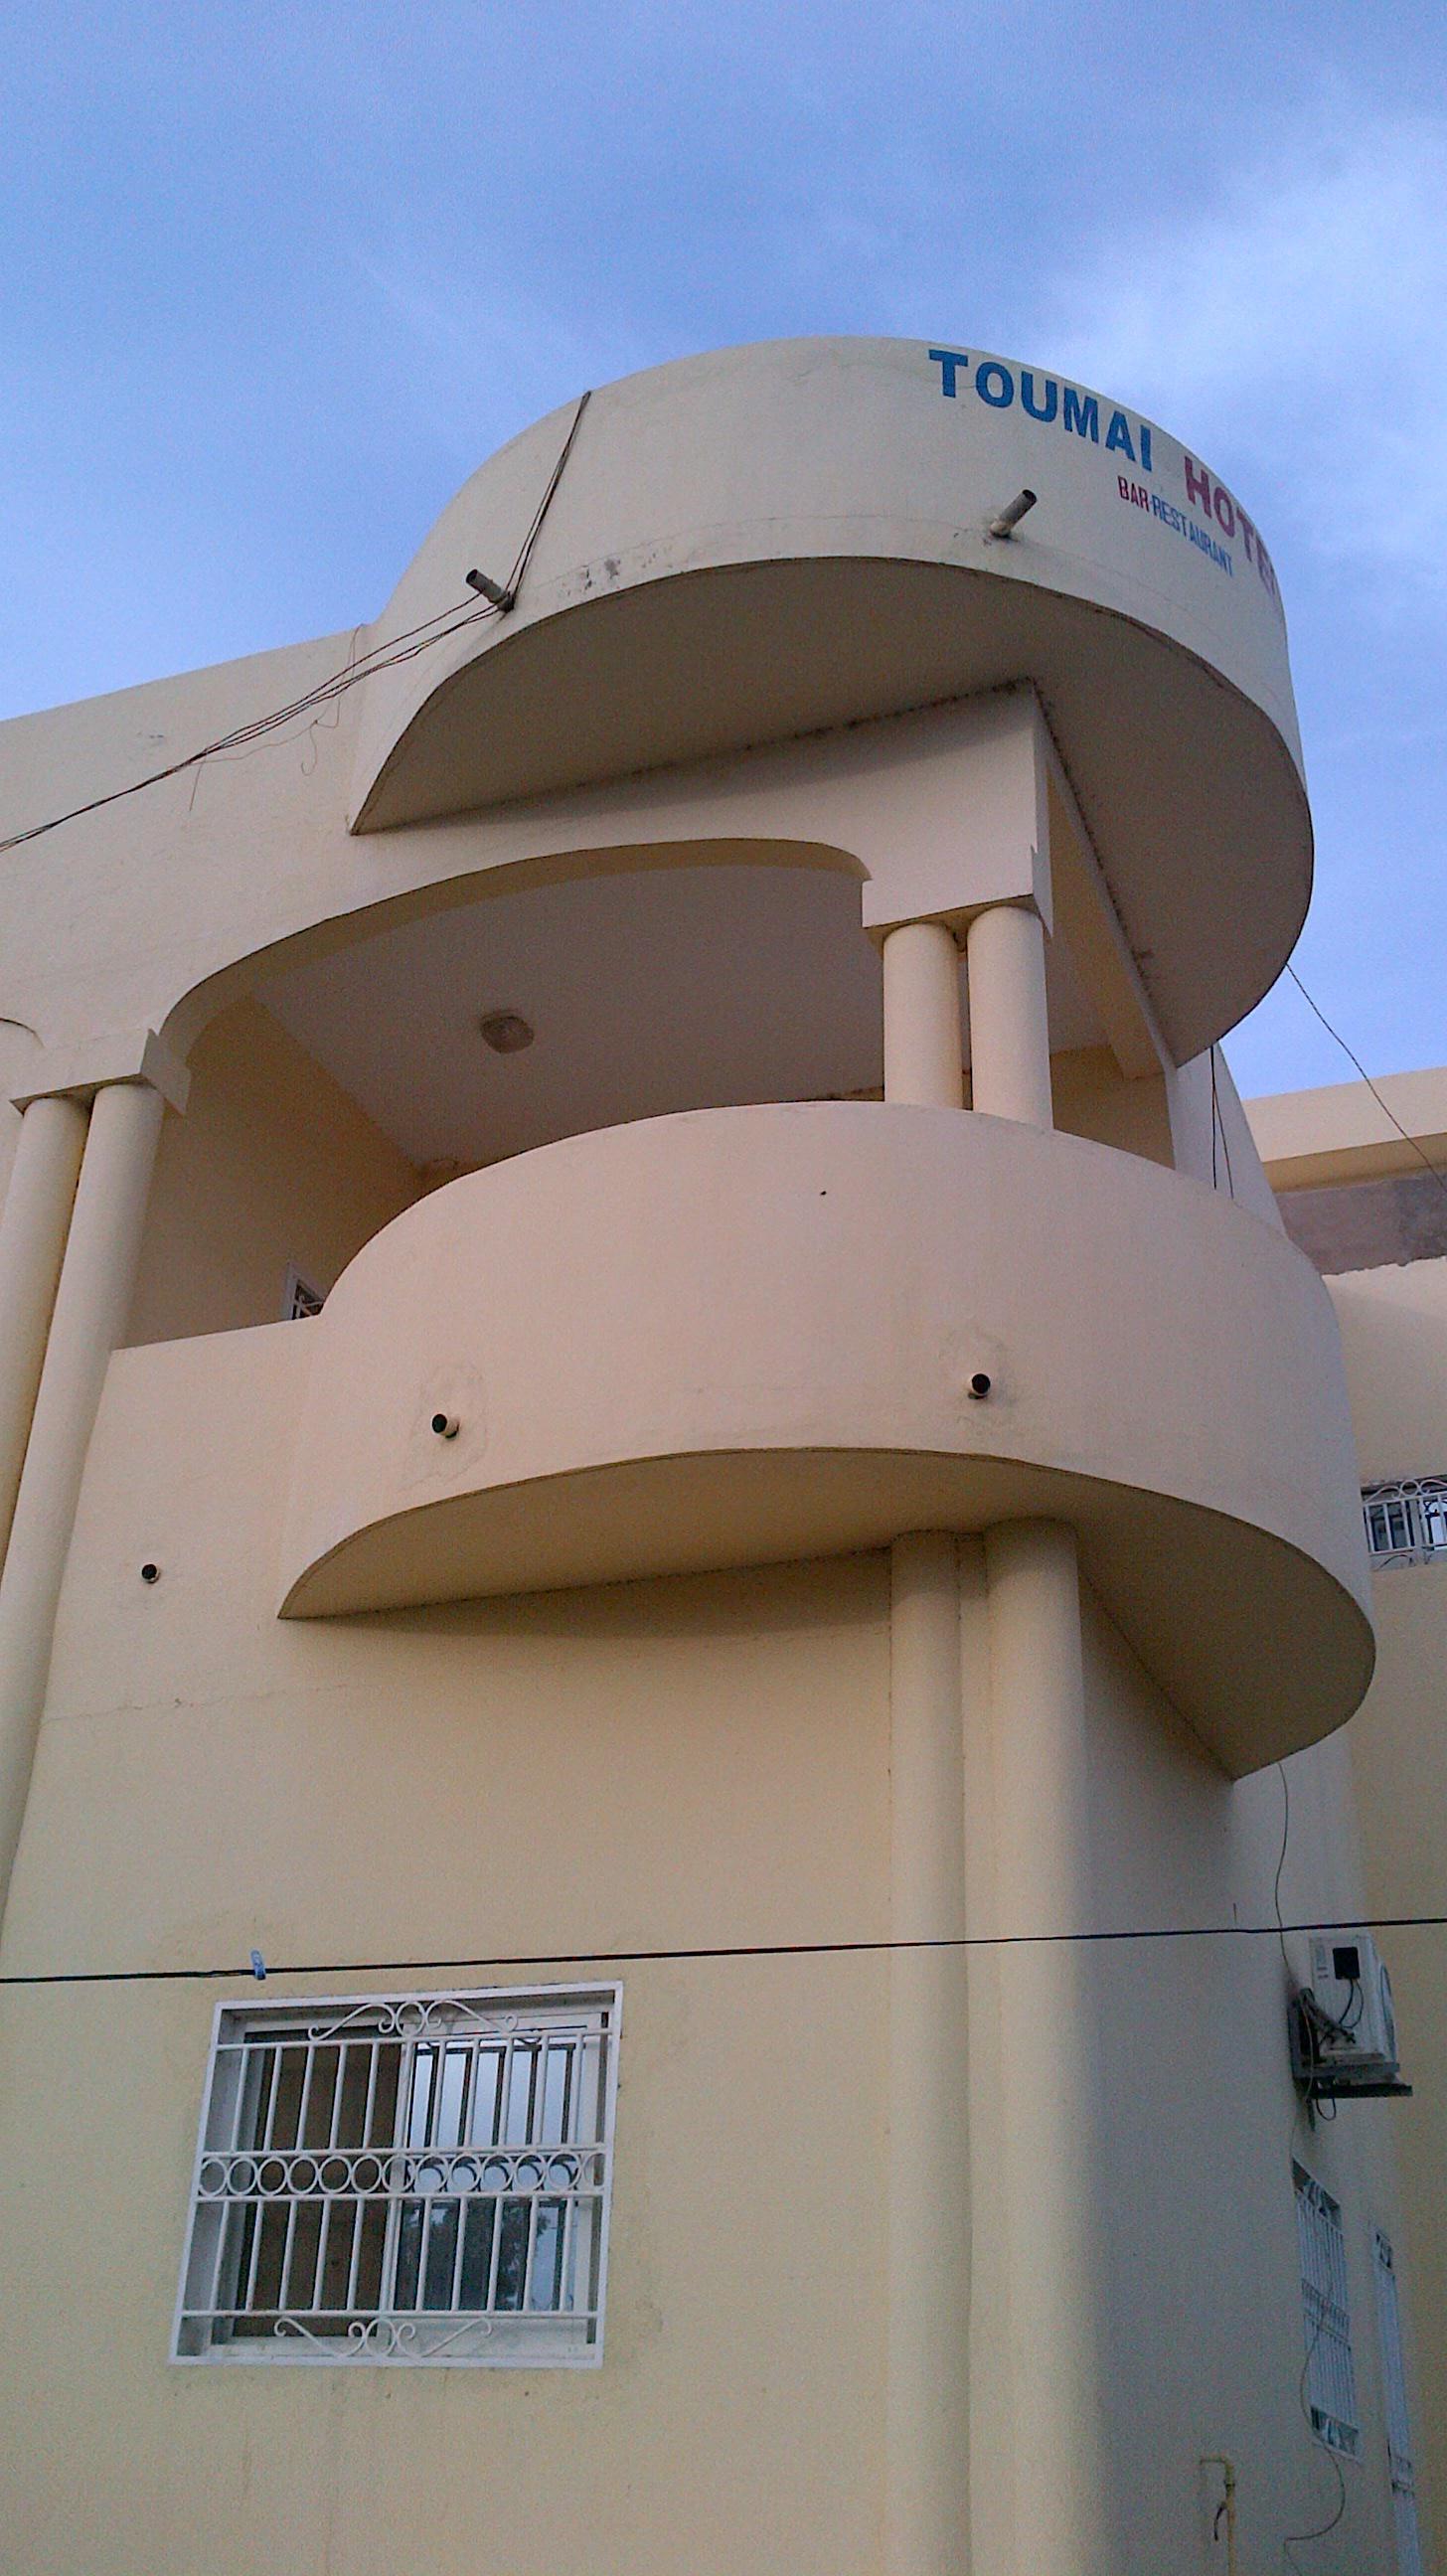 Toumai Hotel Ndjamena, Boulevard Sao, Moursal, Ndjamena, BP 2834, tchad